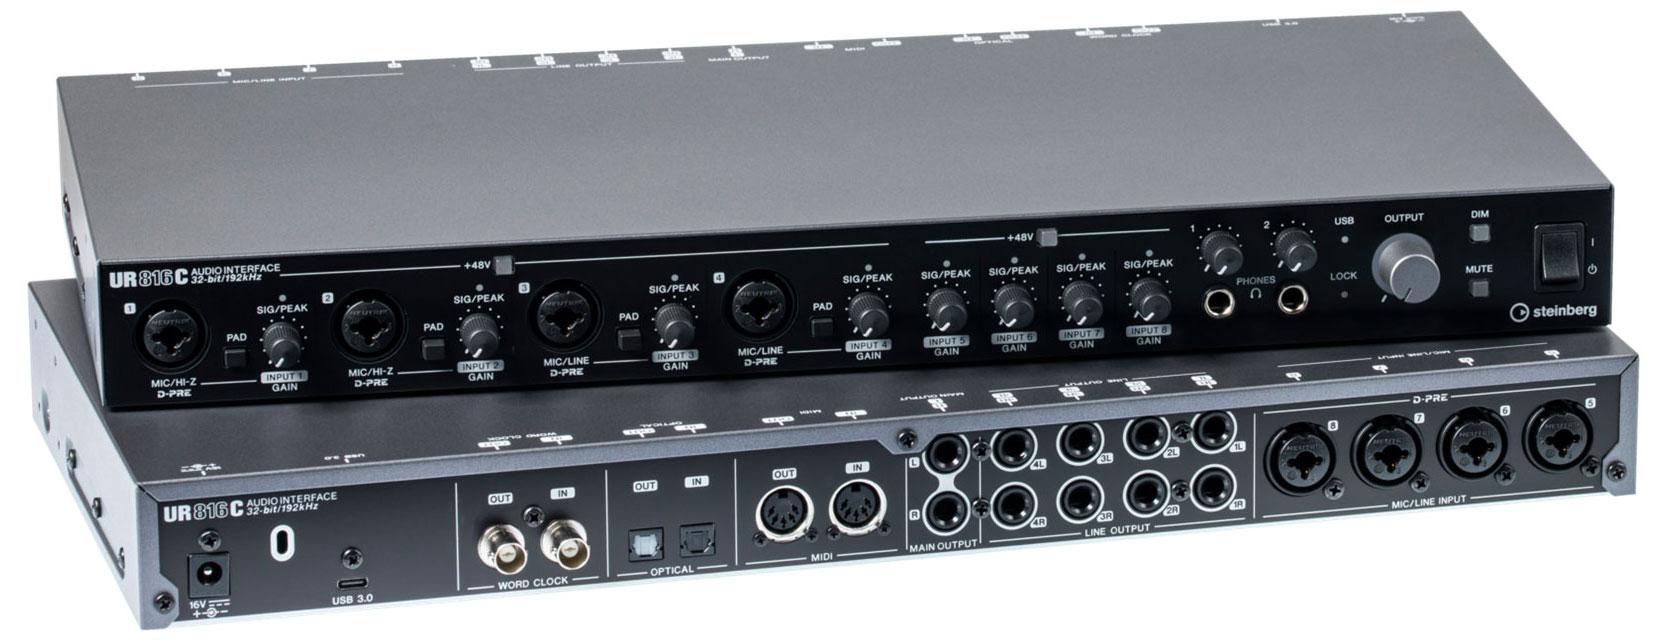 USB аудио интерфейс STEINBERG UR816C